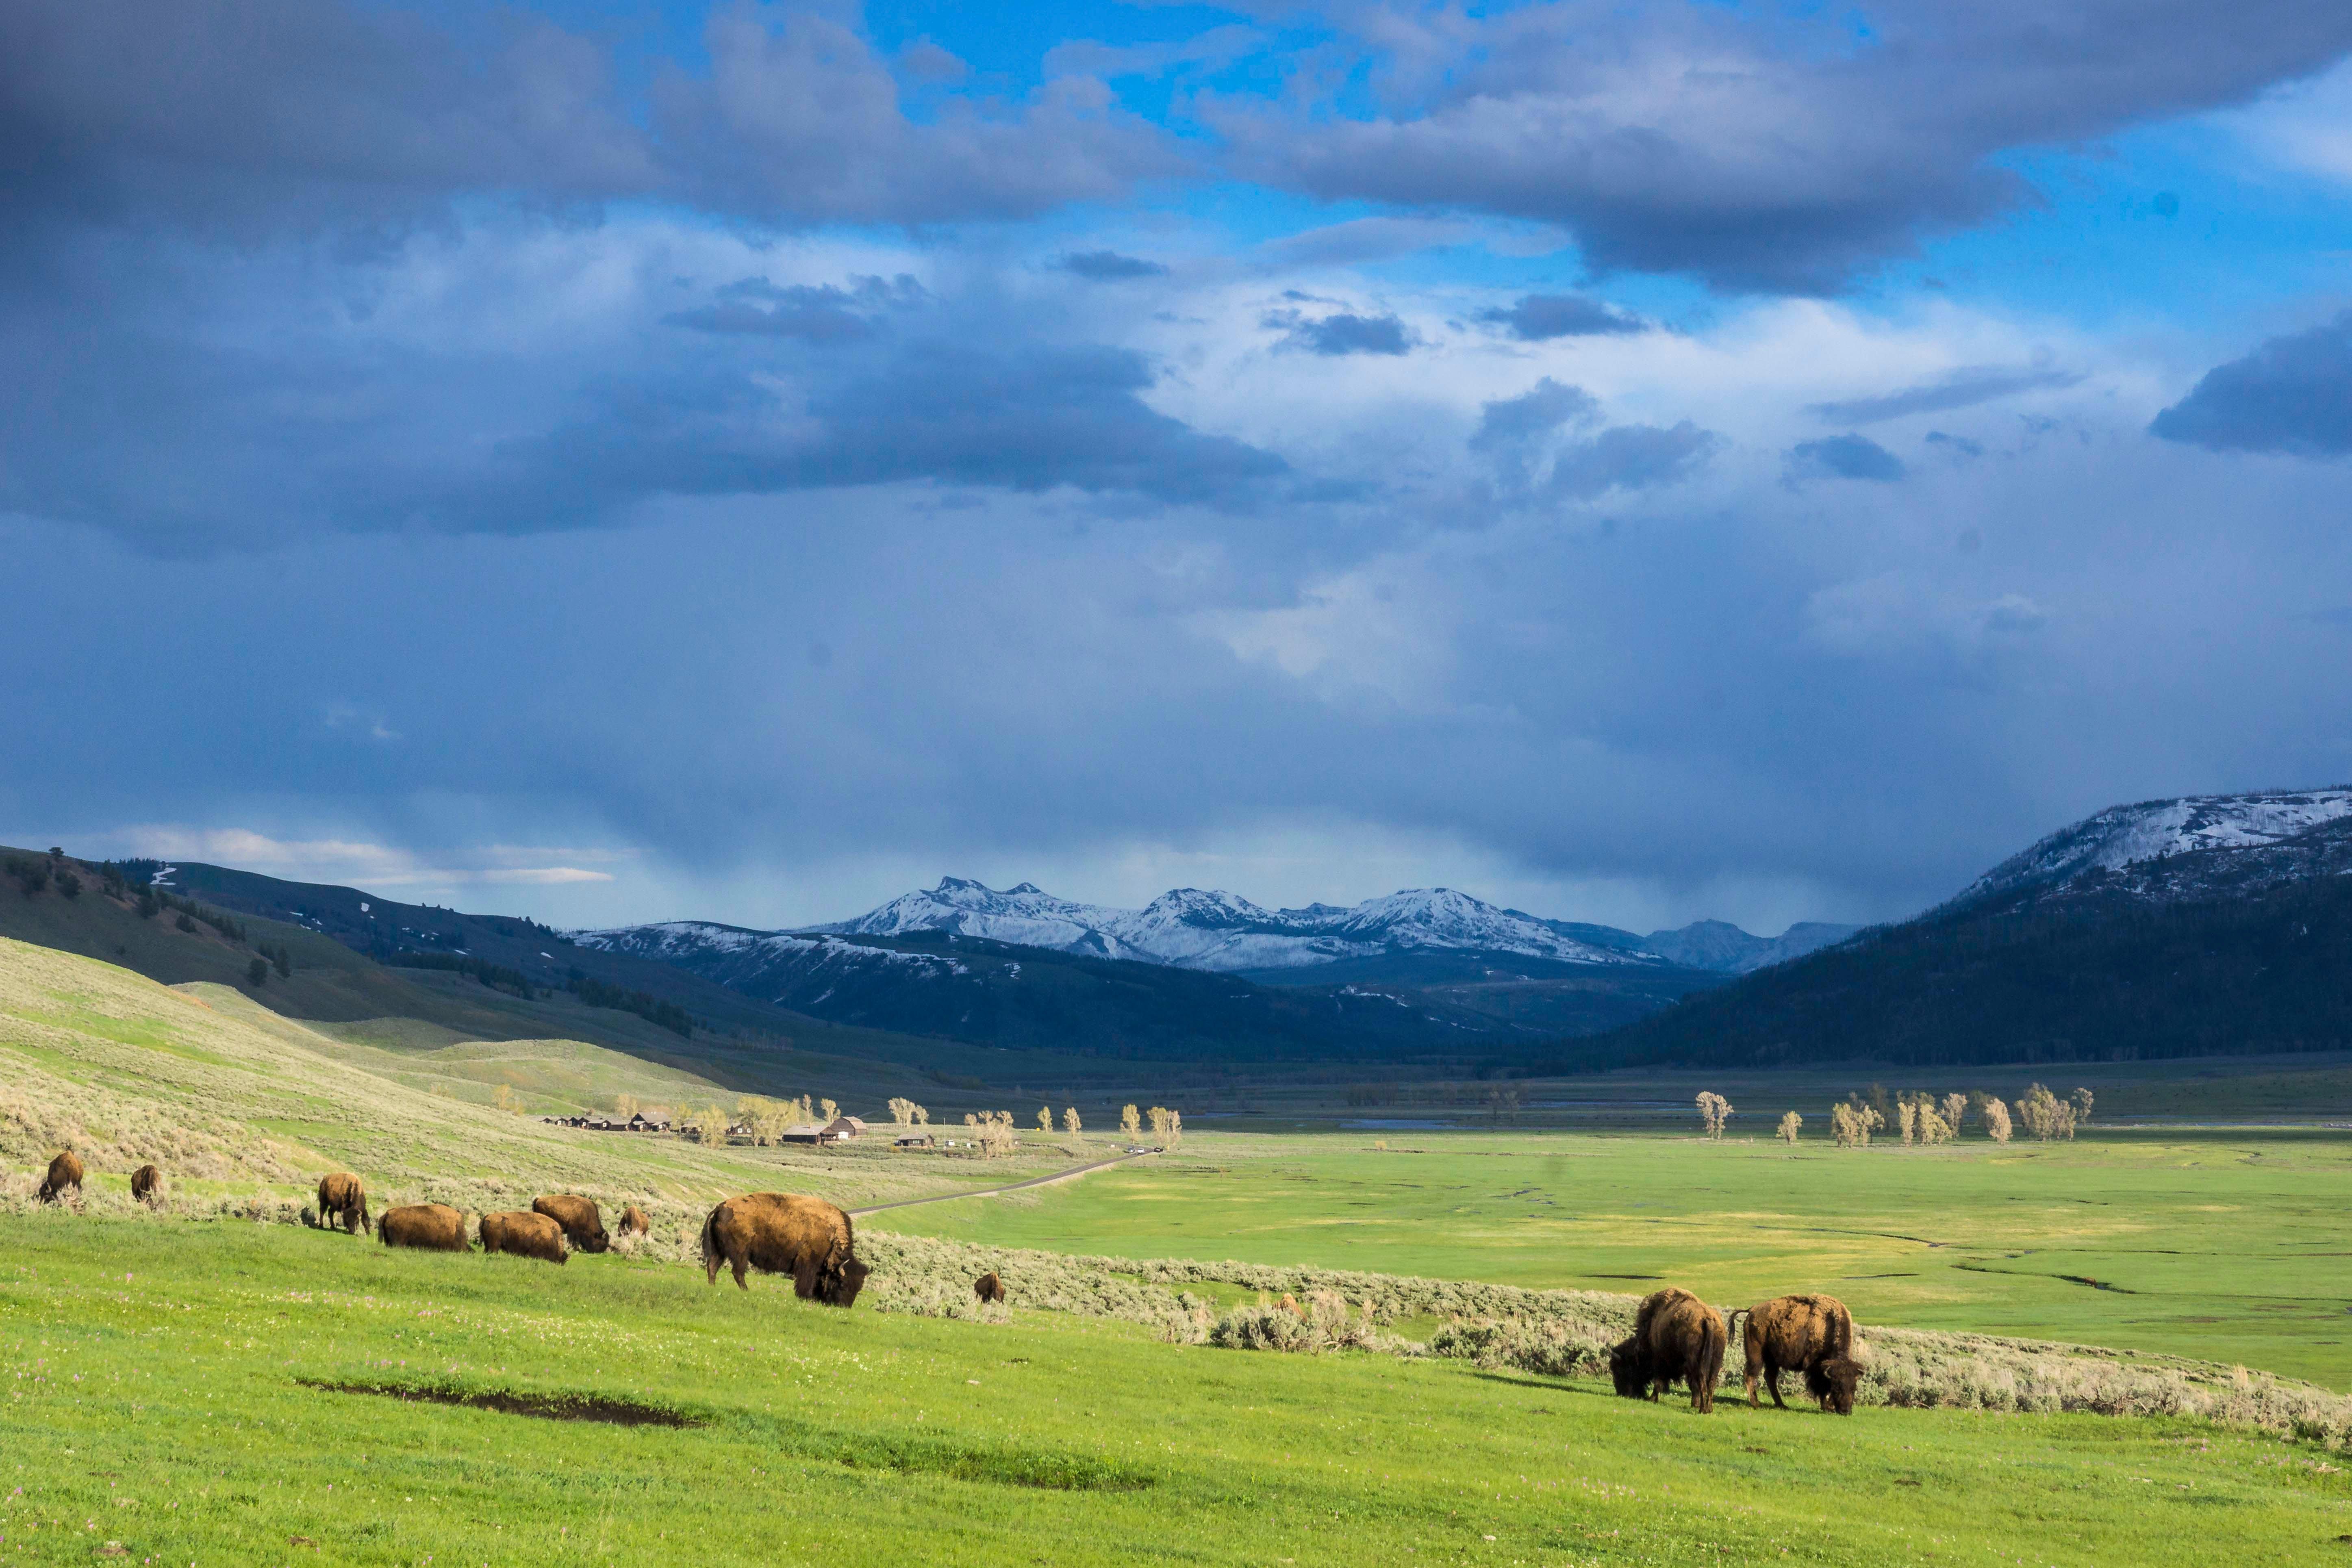 bison grazing in lamar valley, yellowstone